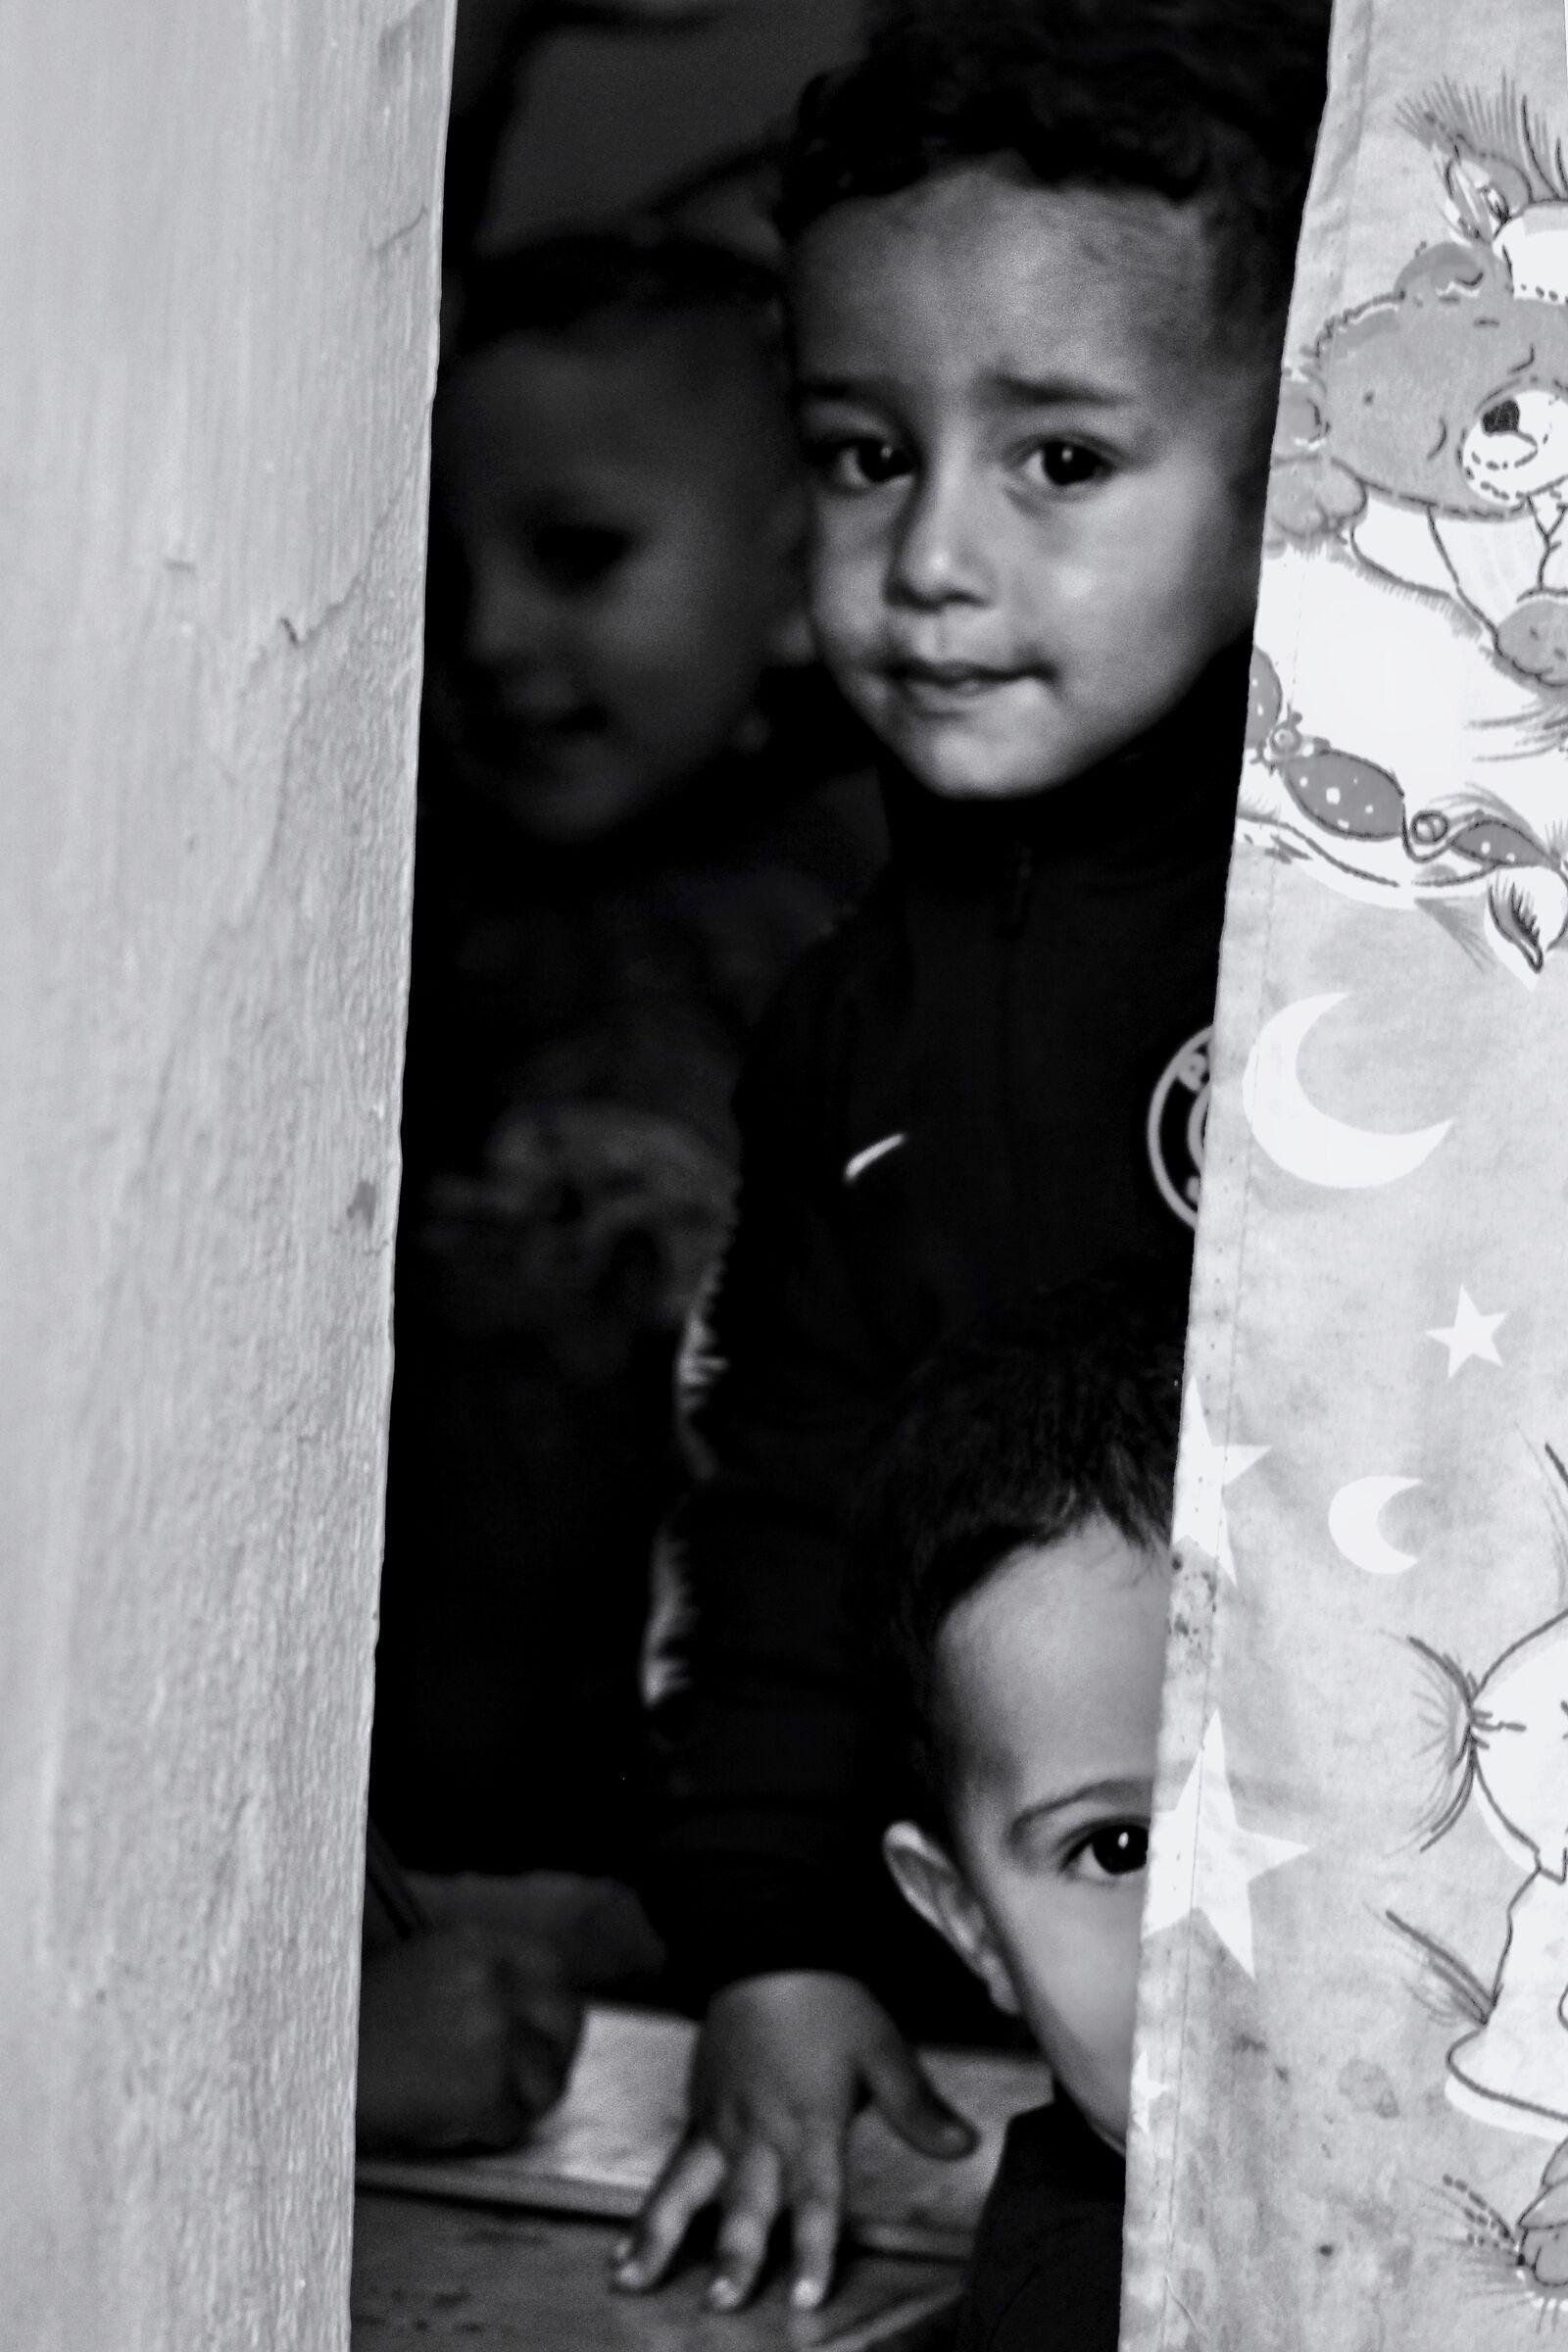 Children look at us...